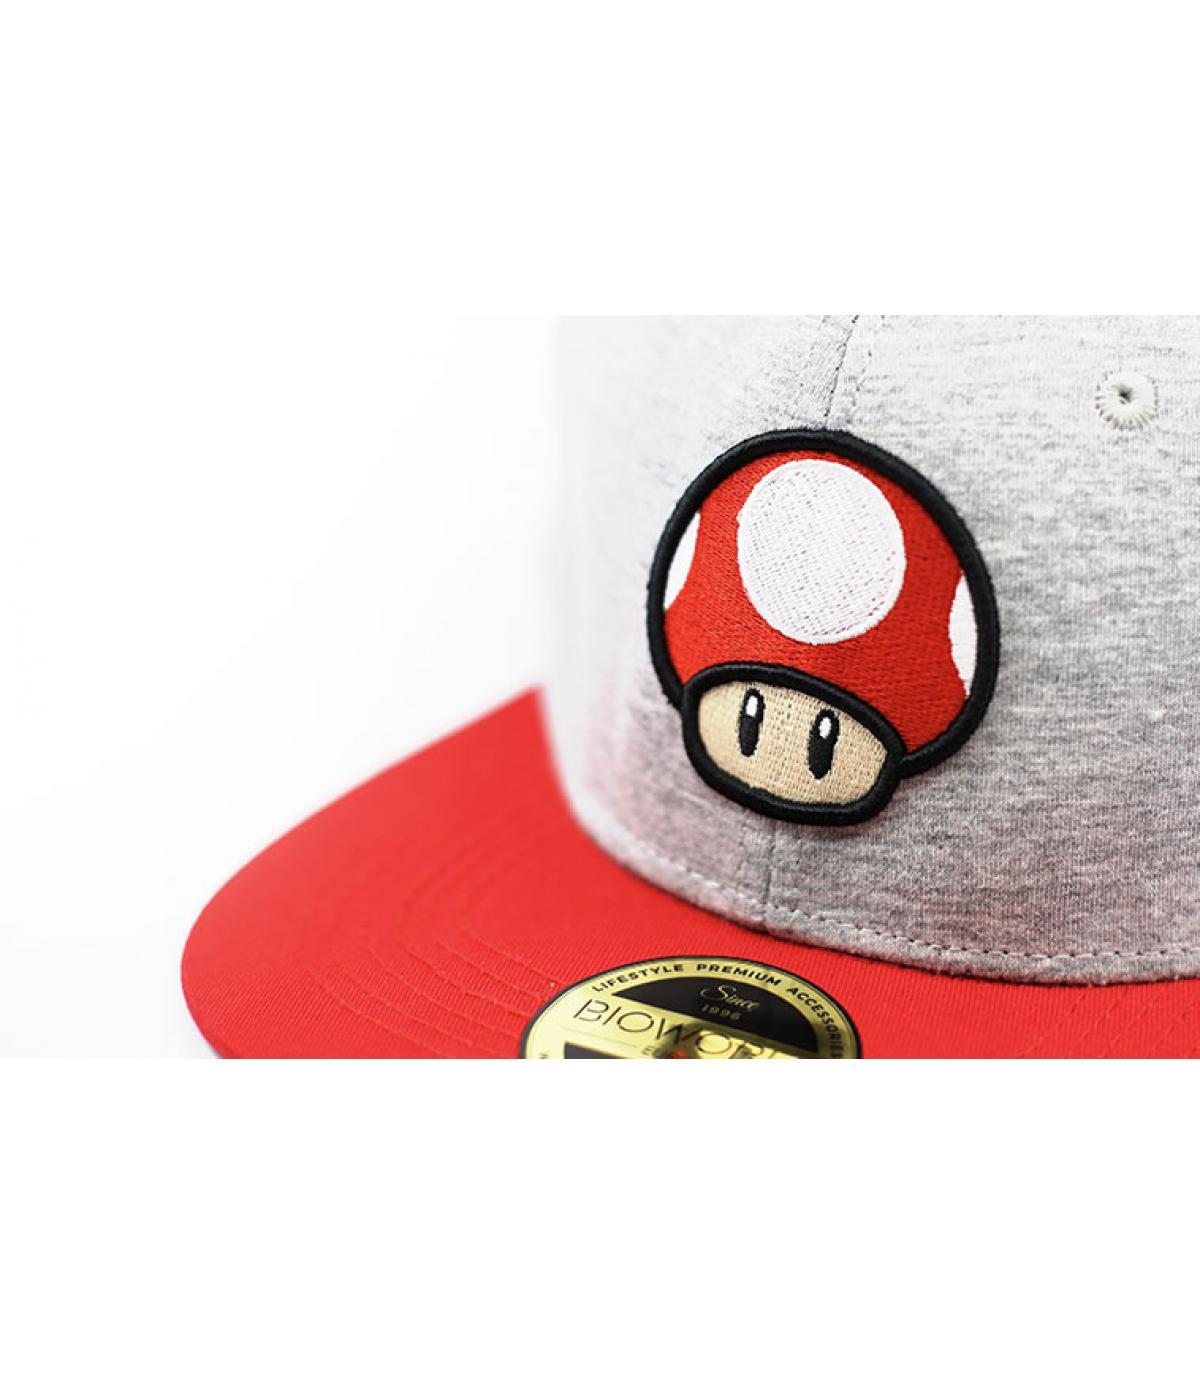 Details Snapback Mushroom Nintendo - Abbildung 3